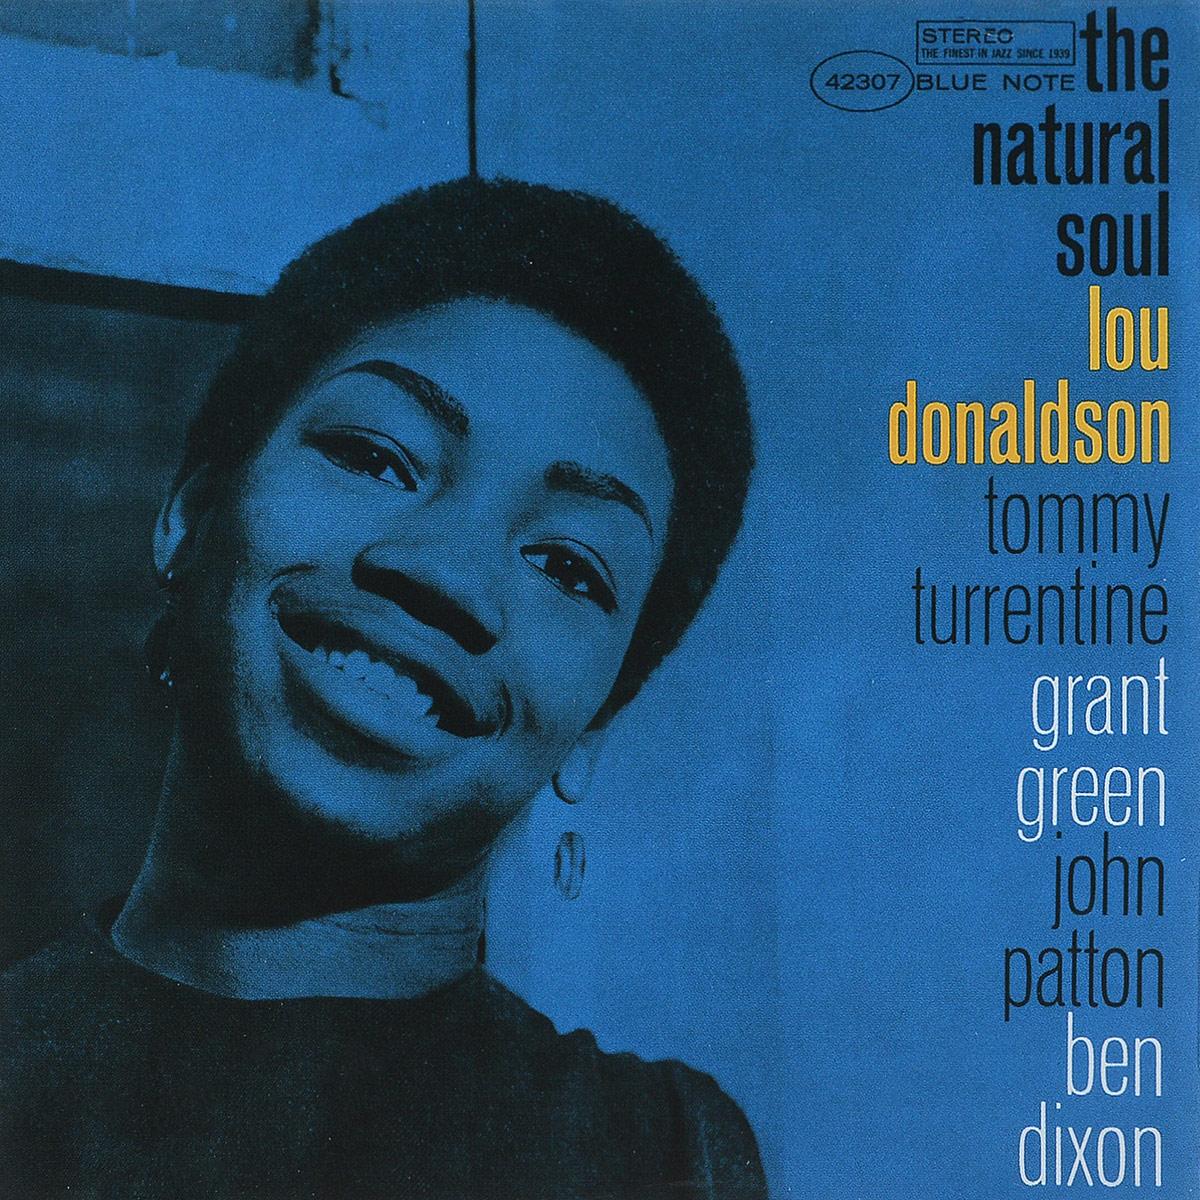 Лу Дональдсон Lou Donaldson. The Natural Soul stephen r donaldson white gold wielder